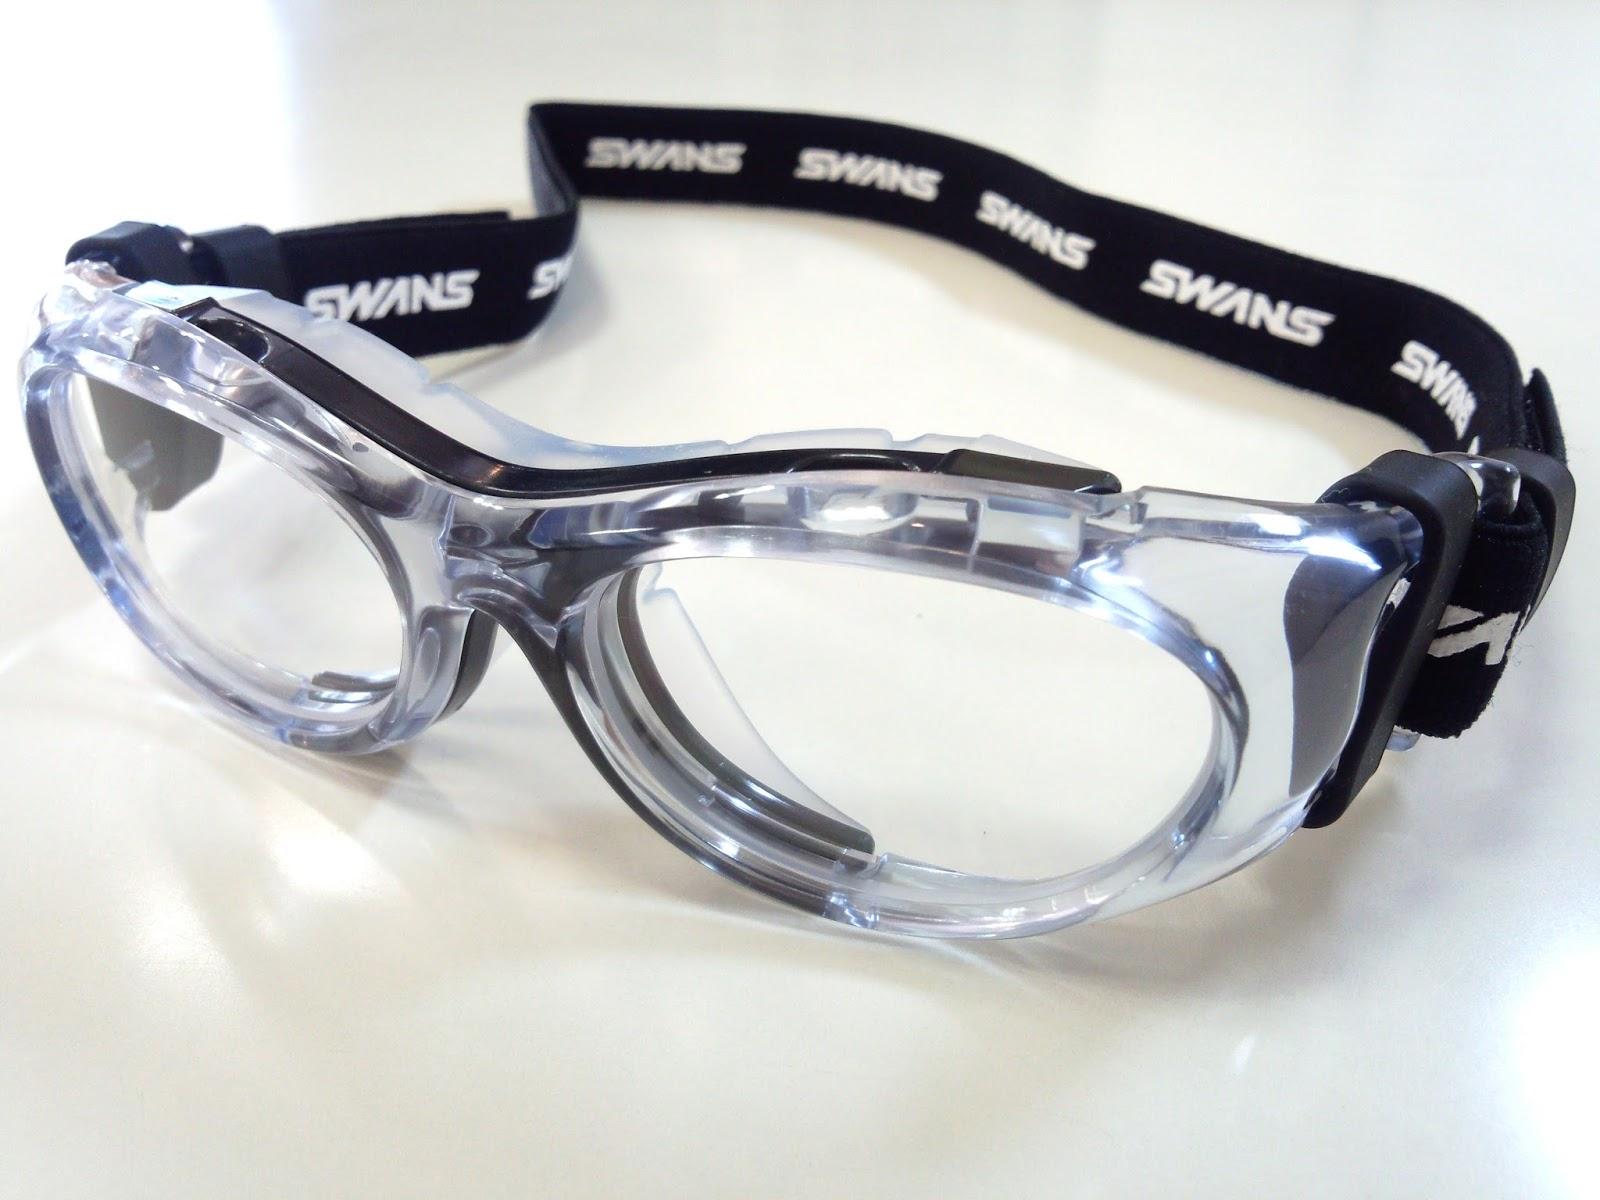 b11d4c97e2 Guard gurdian eye glasses jpg 1600x1200 Guard gurdian eye svs 700n glasses